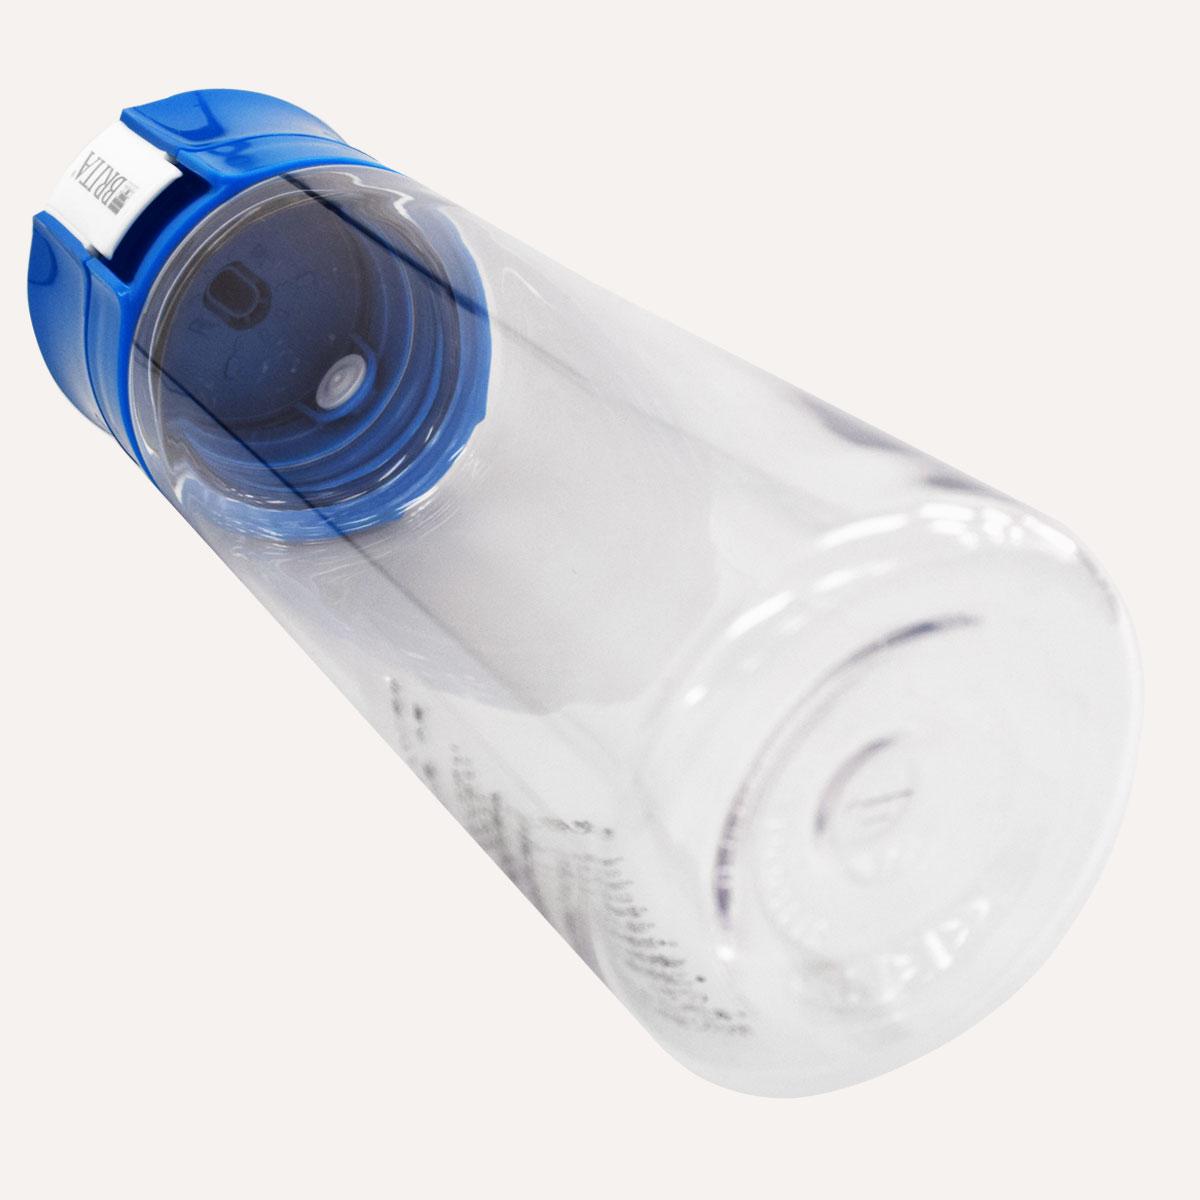 BRITA(ブリタ) 浄水機能付きボトル フィルアンドゴー 600ml 包装箱入り